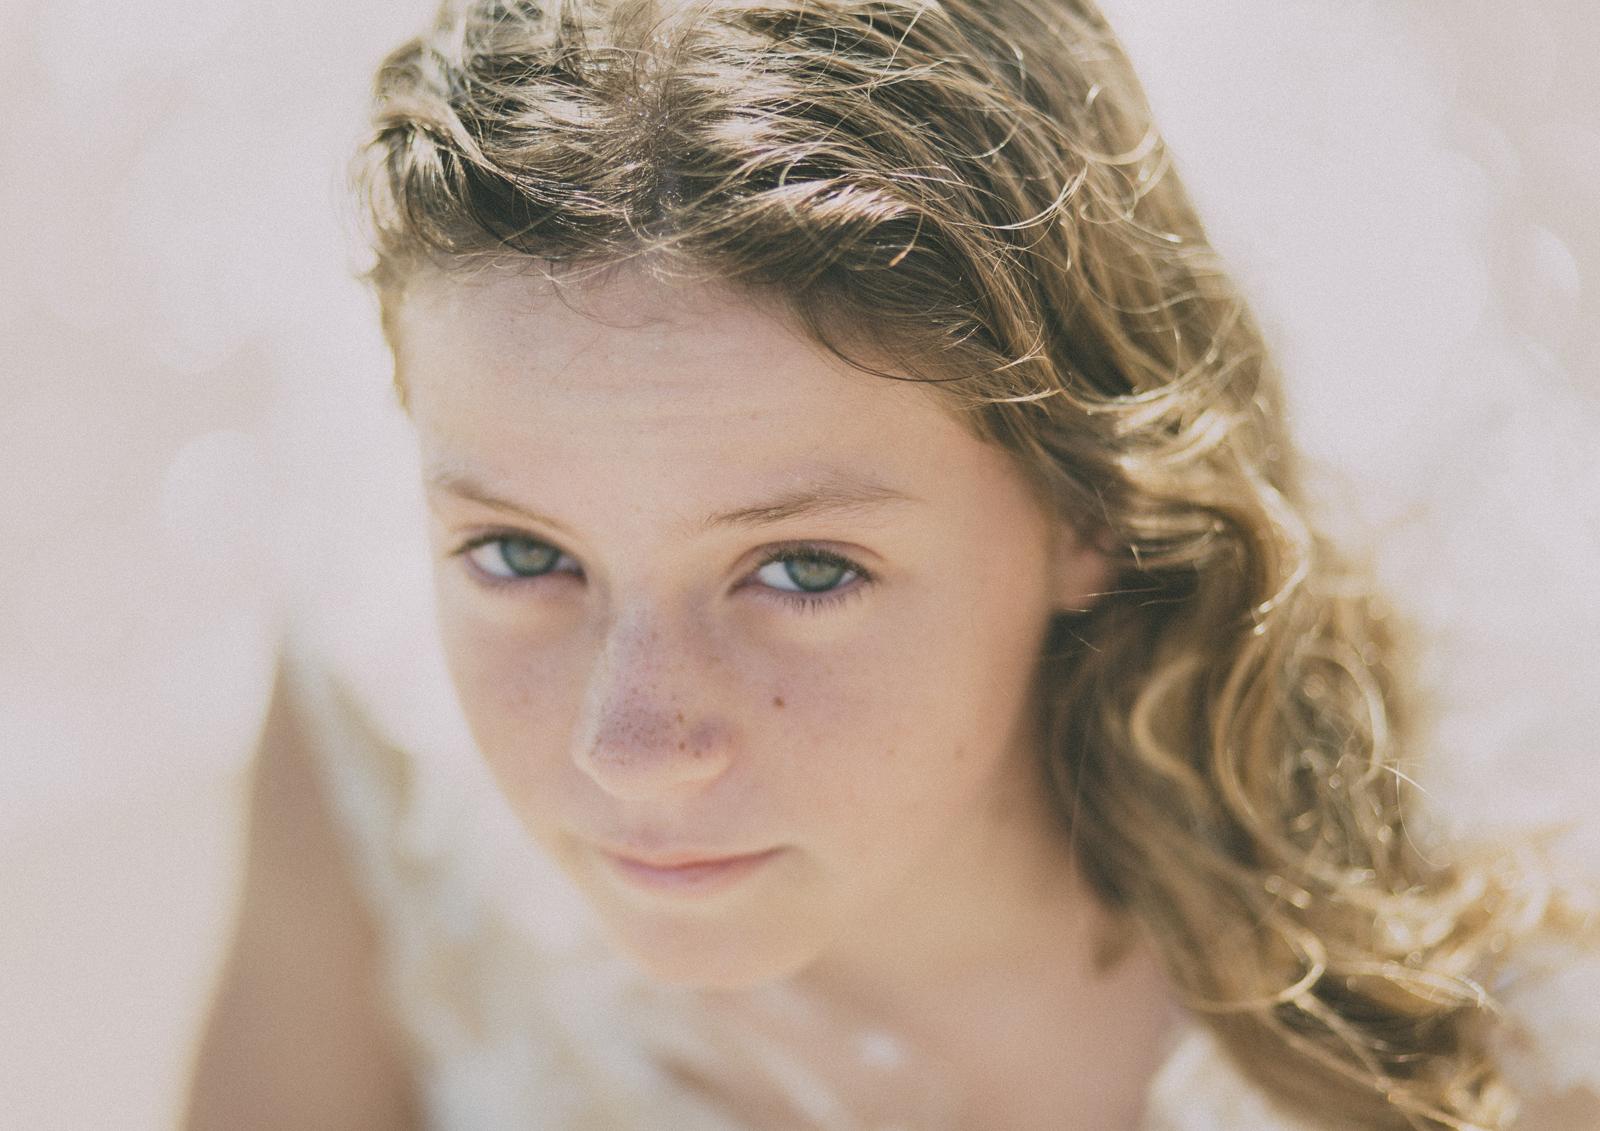 Watch Them Grow Photography Tween & Teenager Photo Shoots